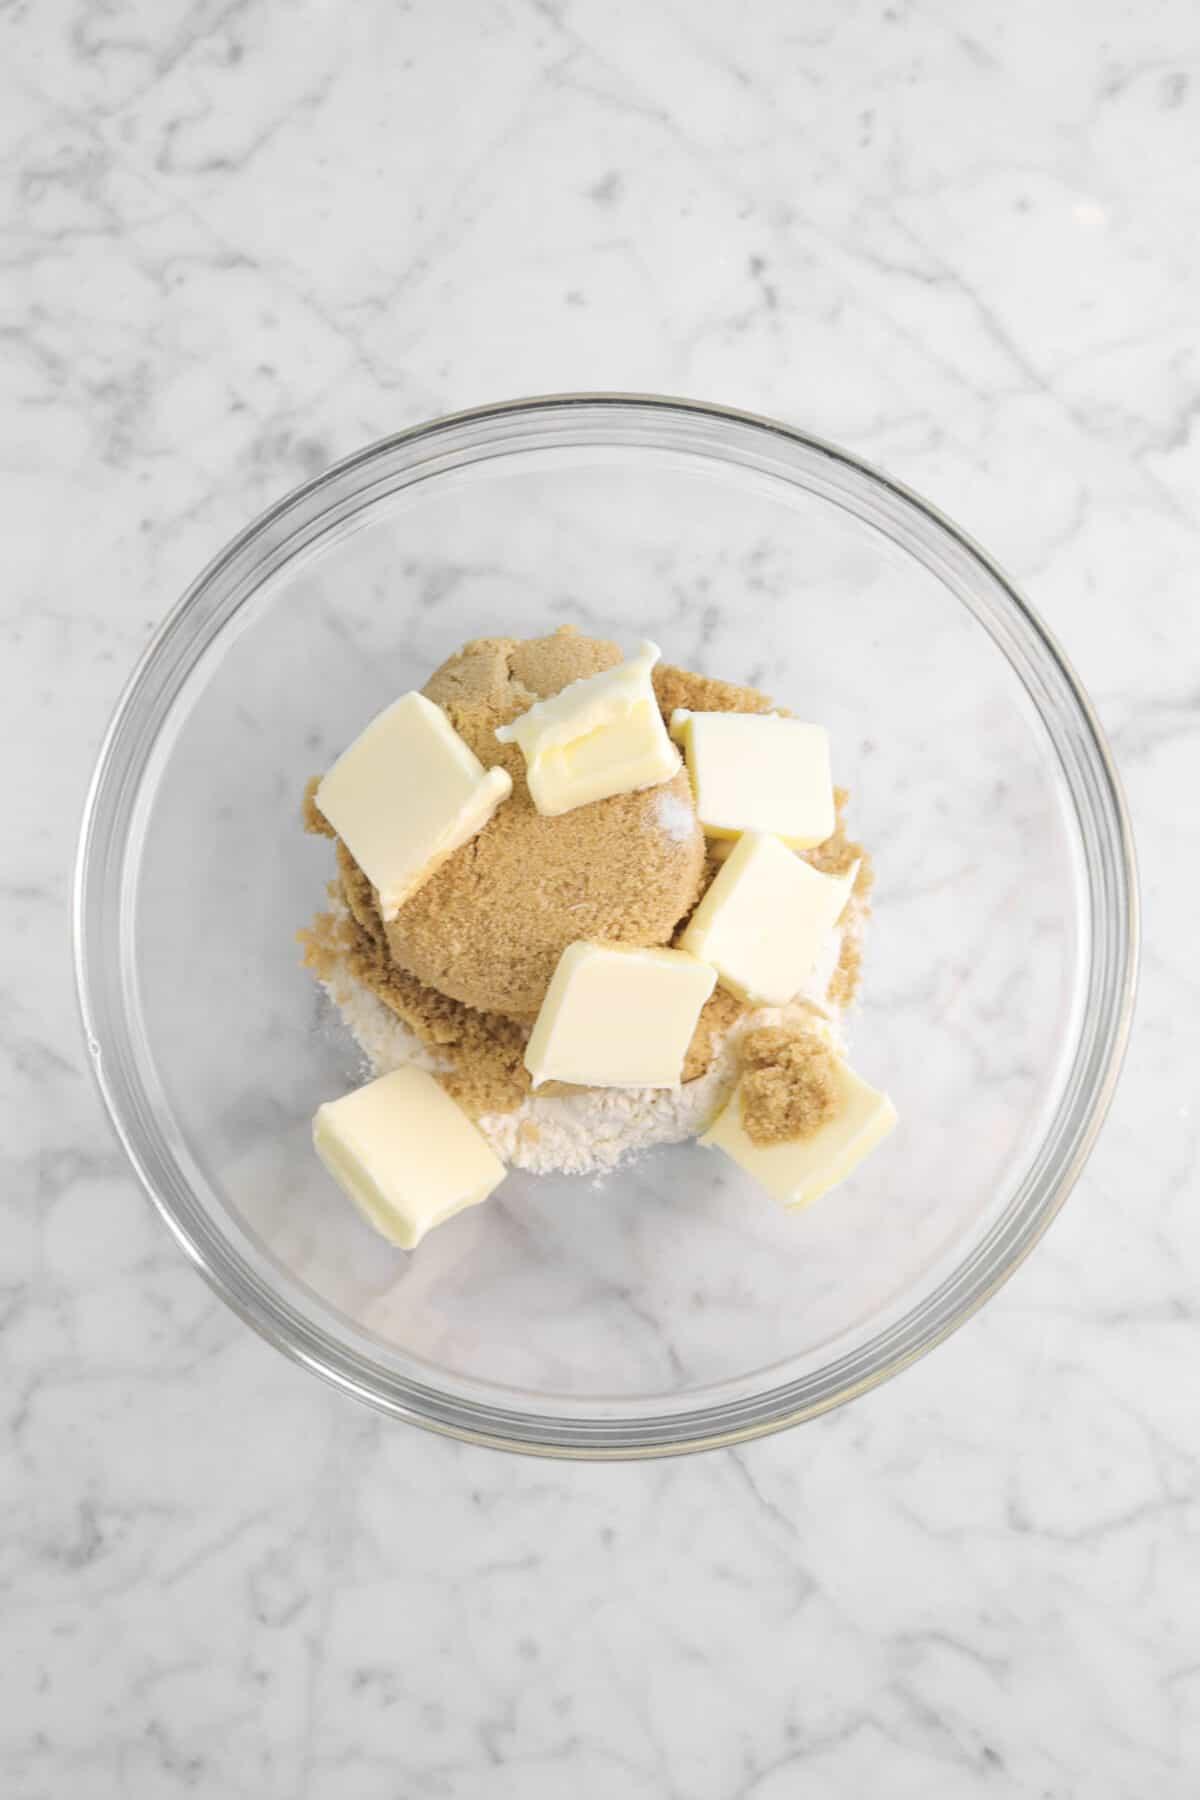 flour, brown sugar, salt, and butter in a glass bowl